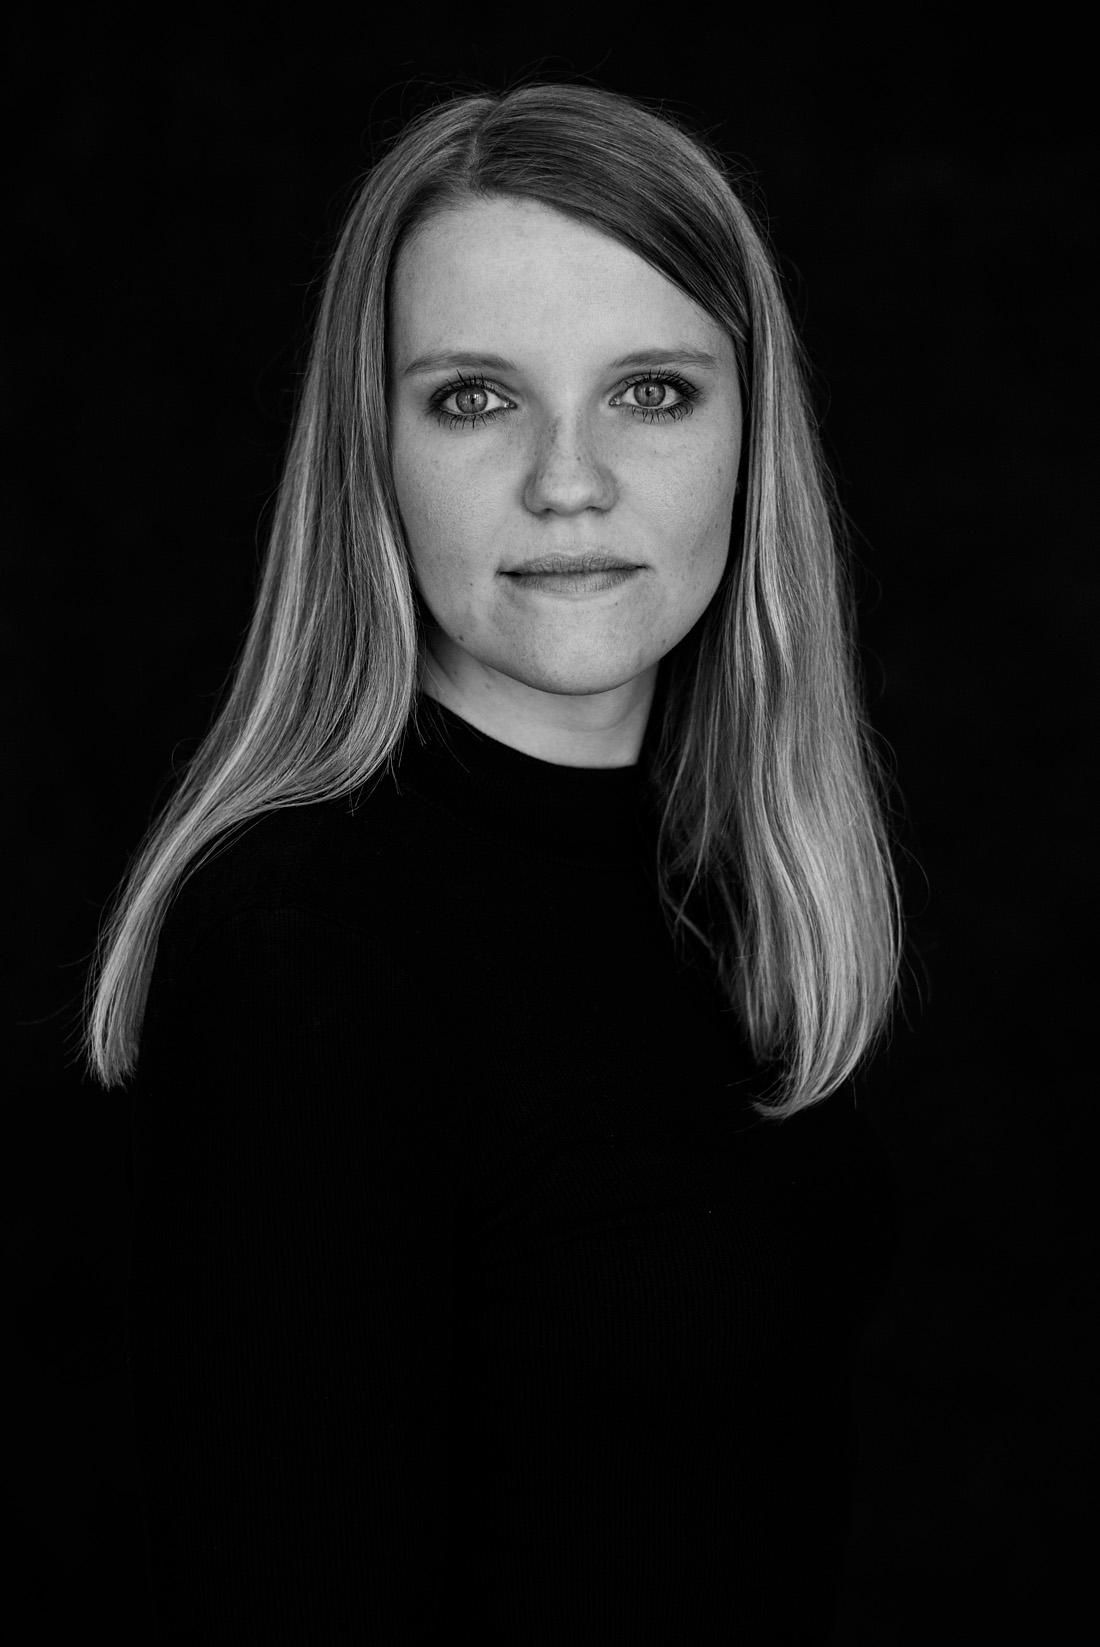 cadeau-tips-jubileum-ouders-zwart-wit-portret